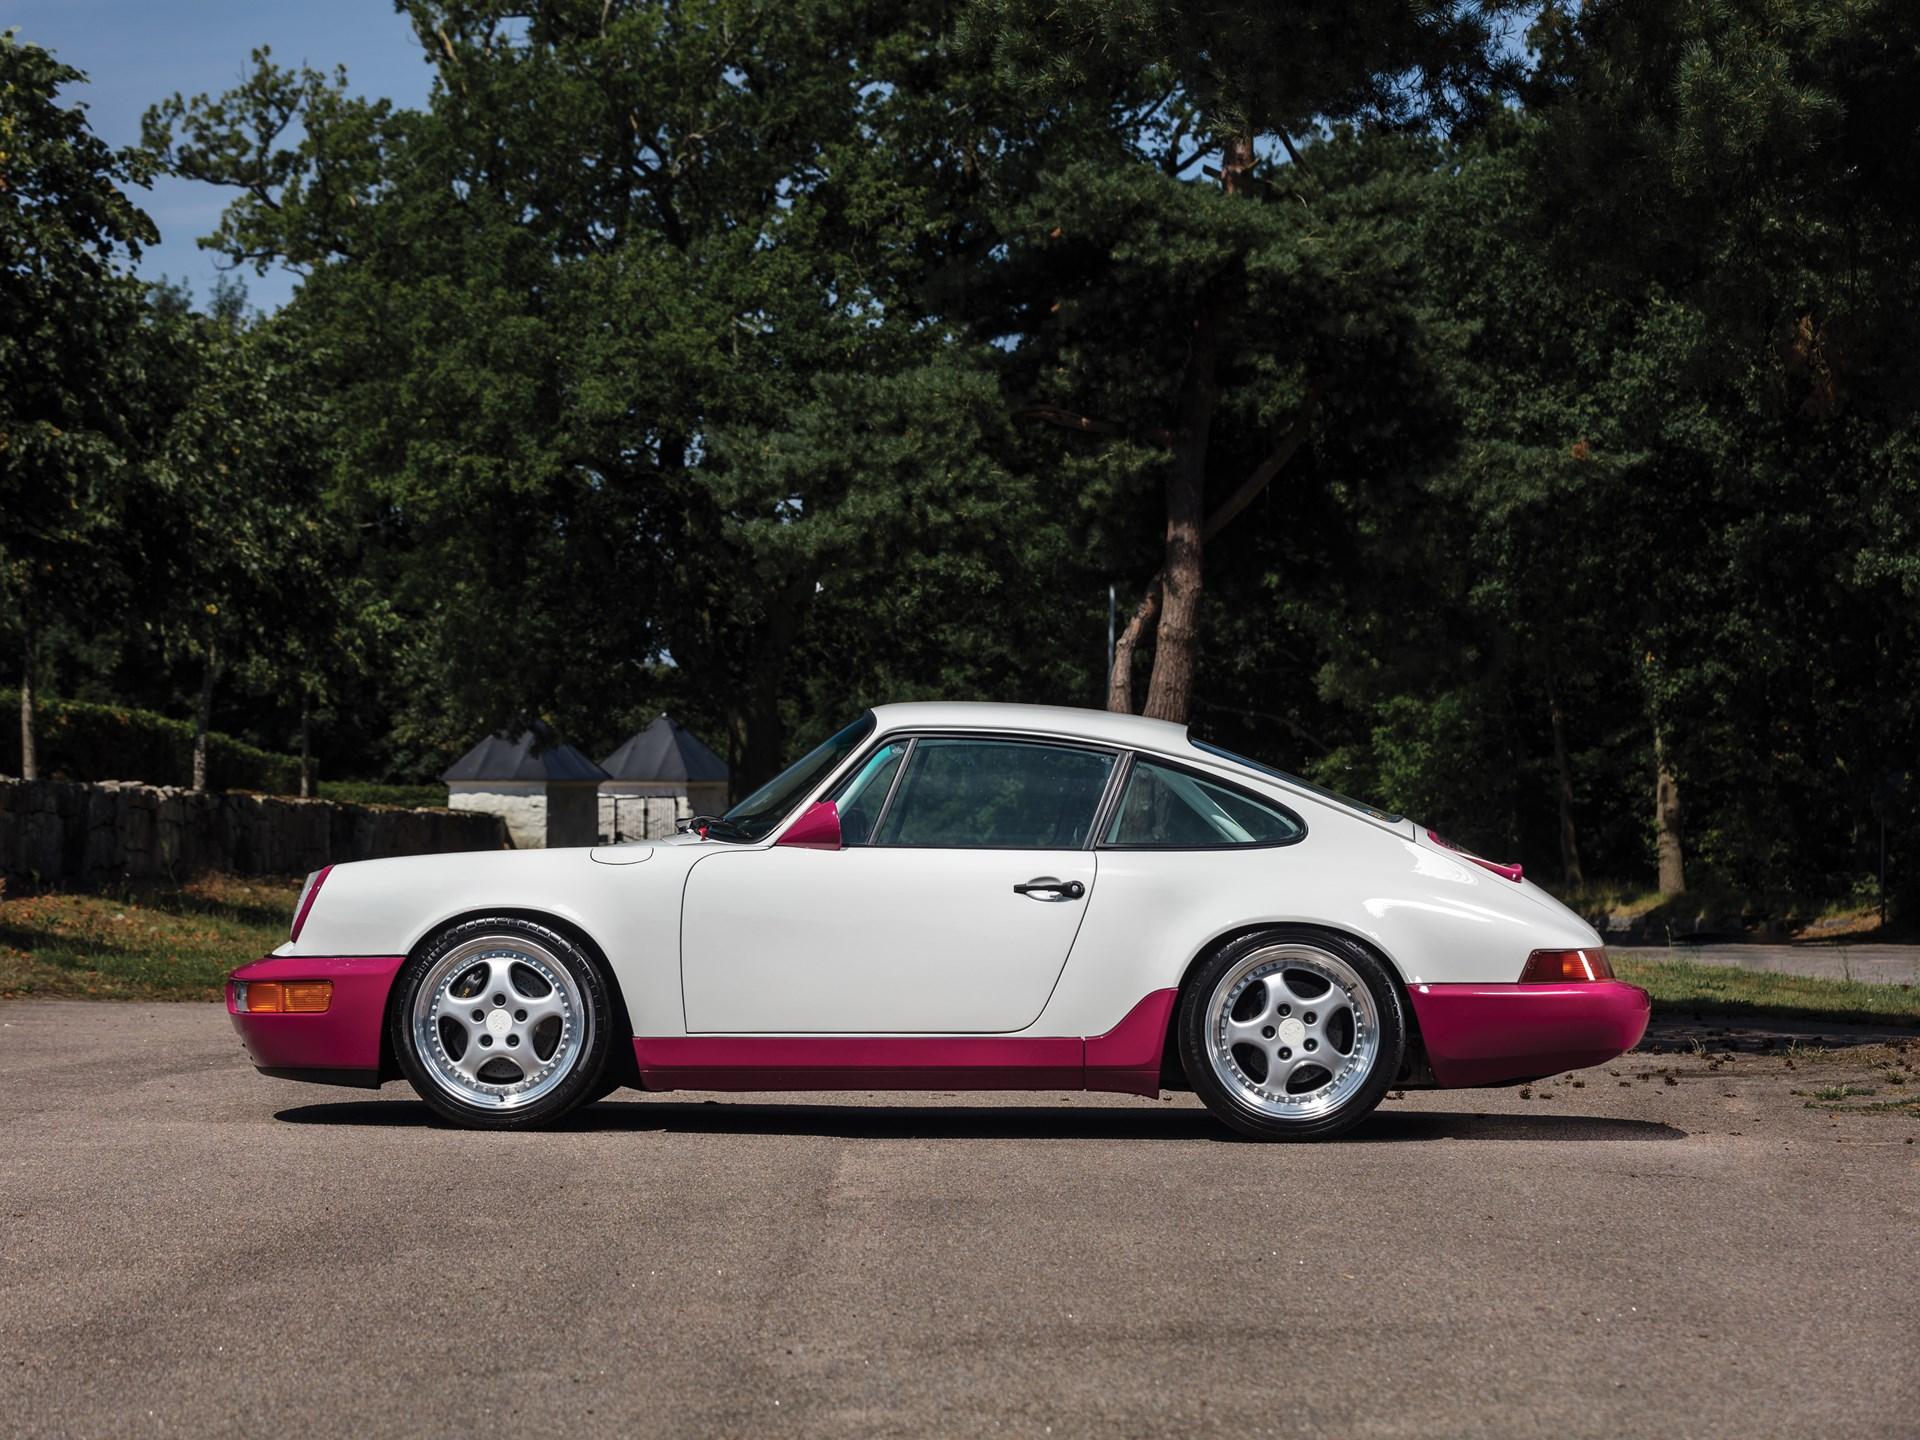 rm sotheby's - 1990 porsche 911 carrera cup | london 2018